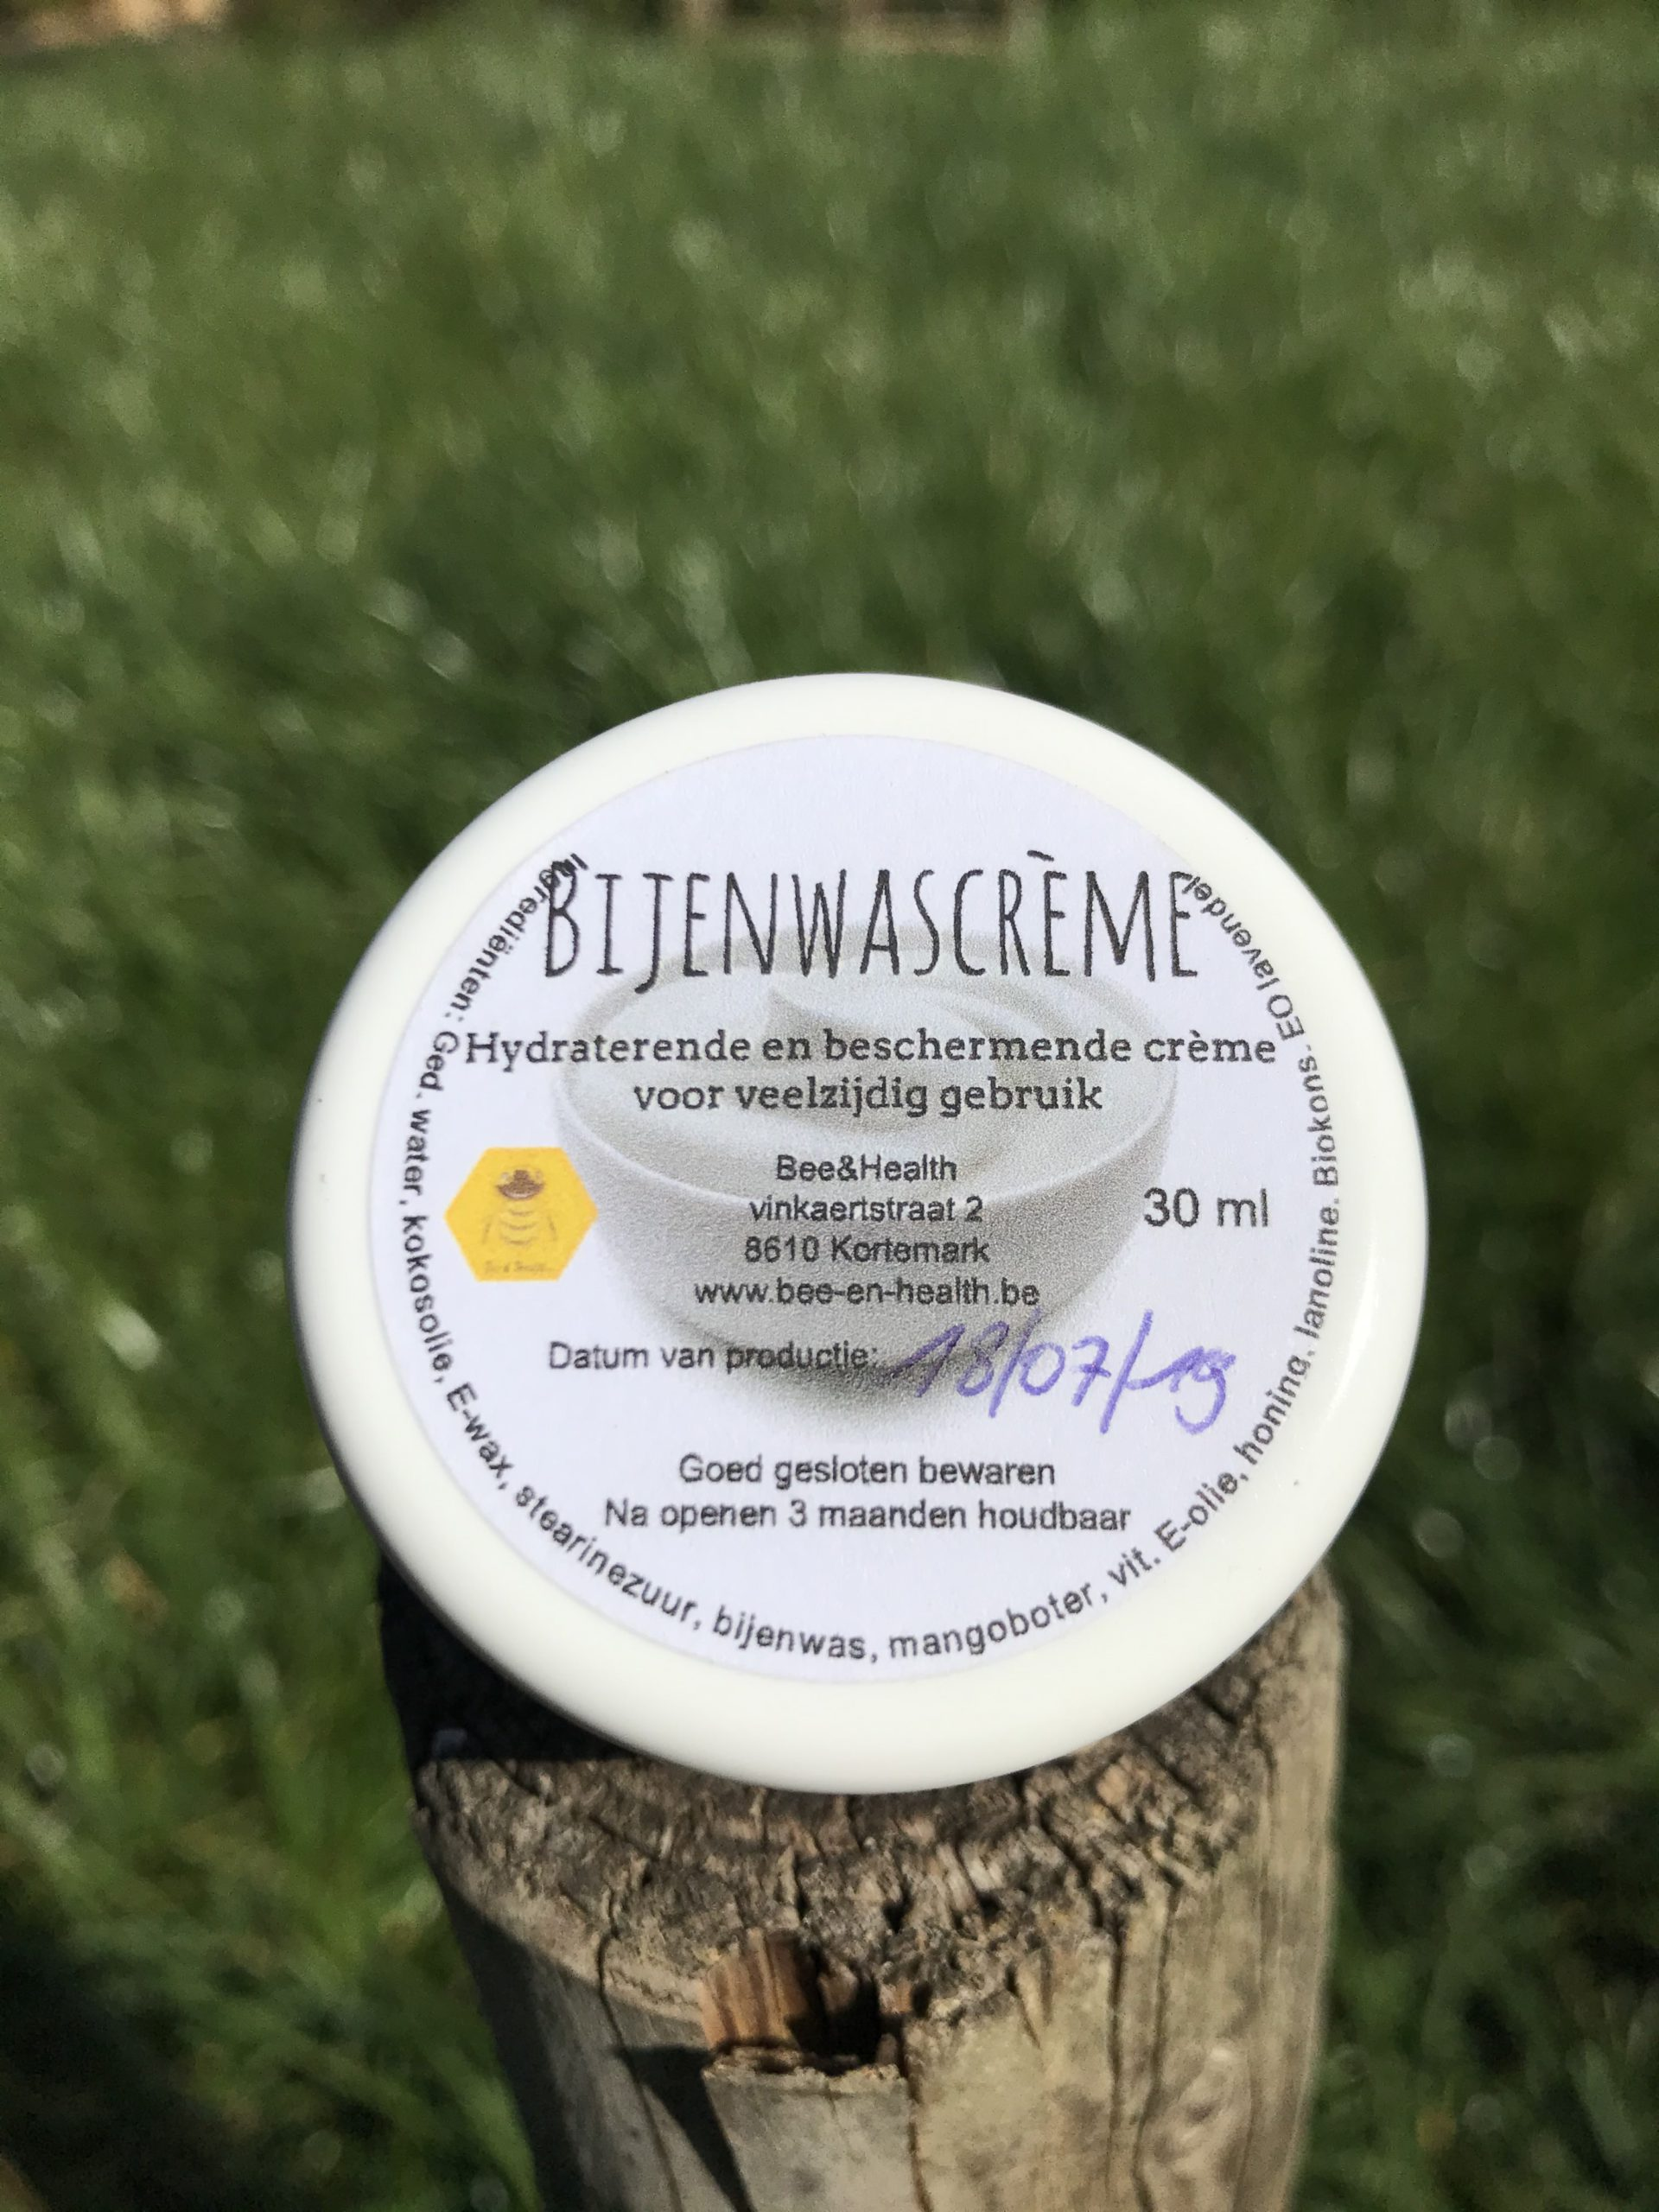 Bijenwascrème